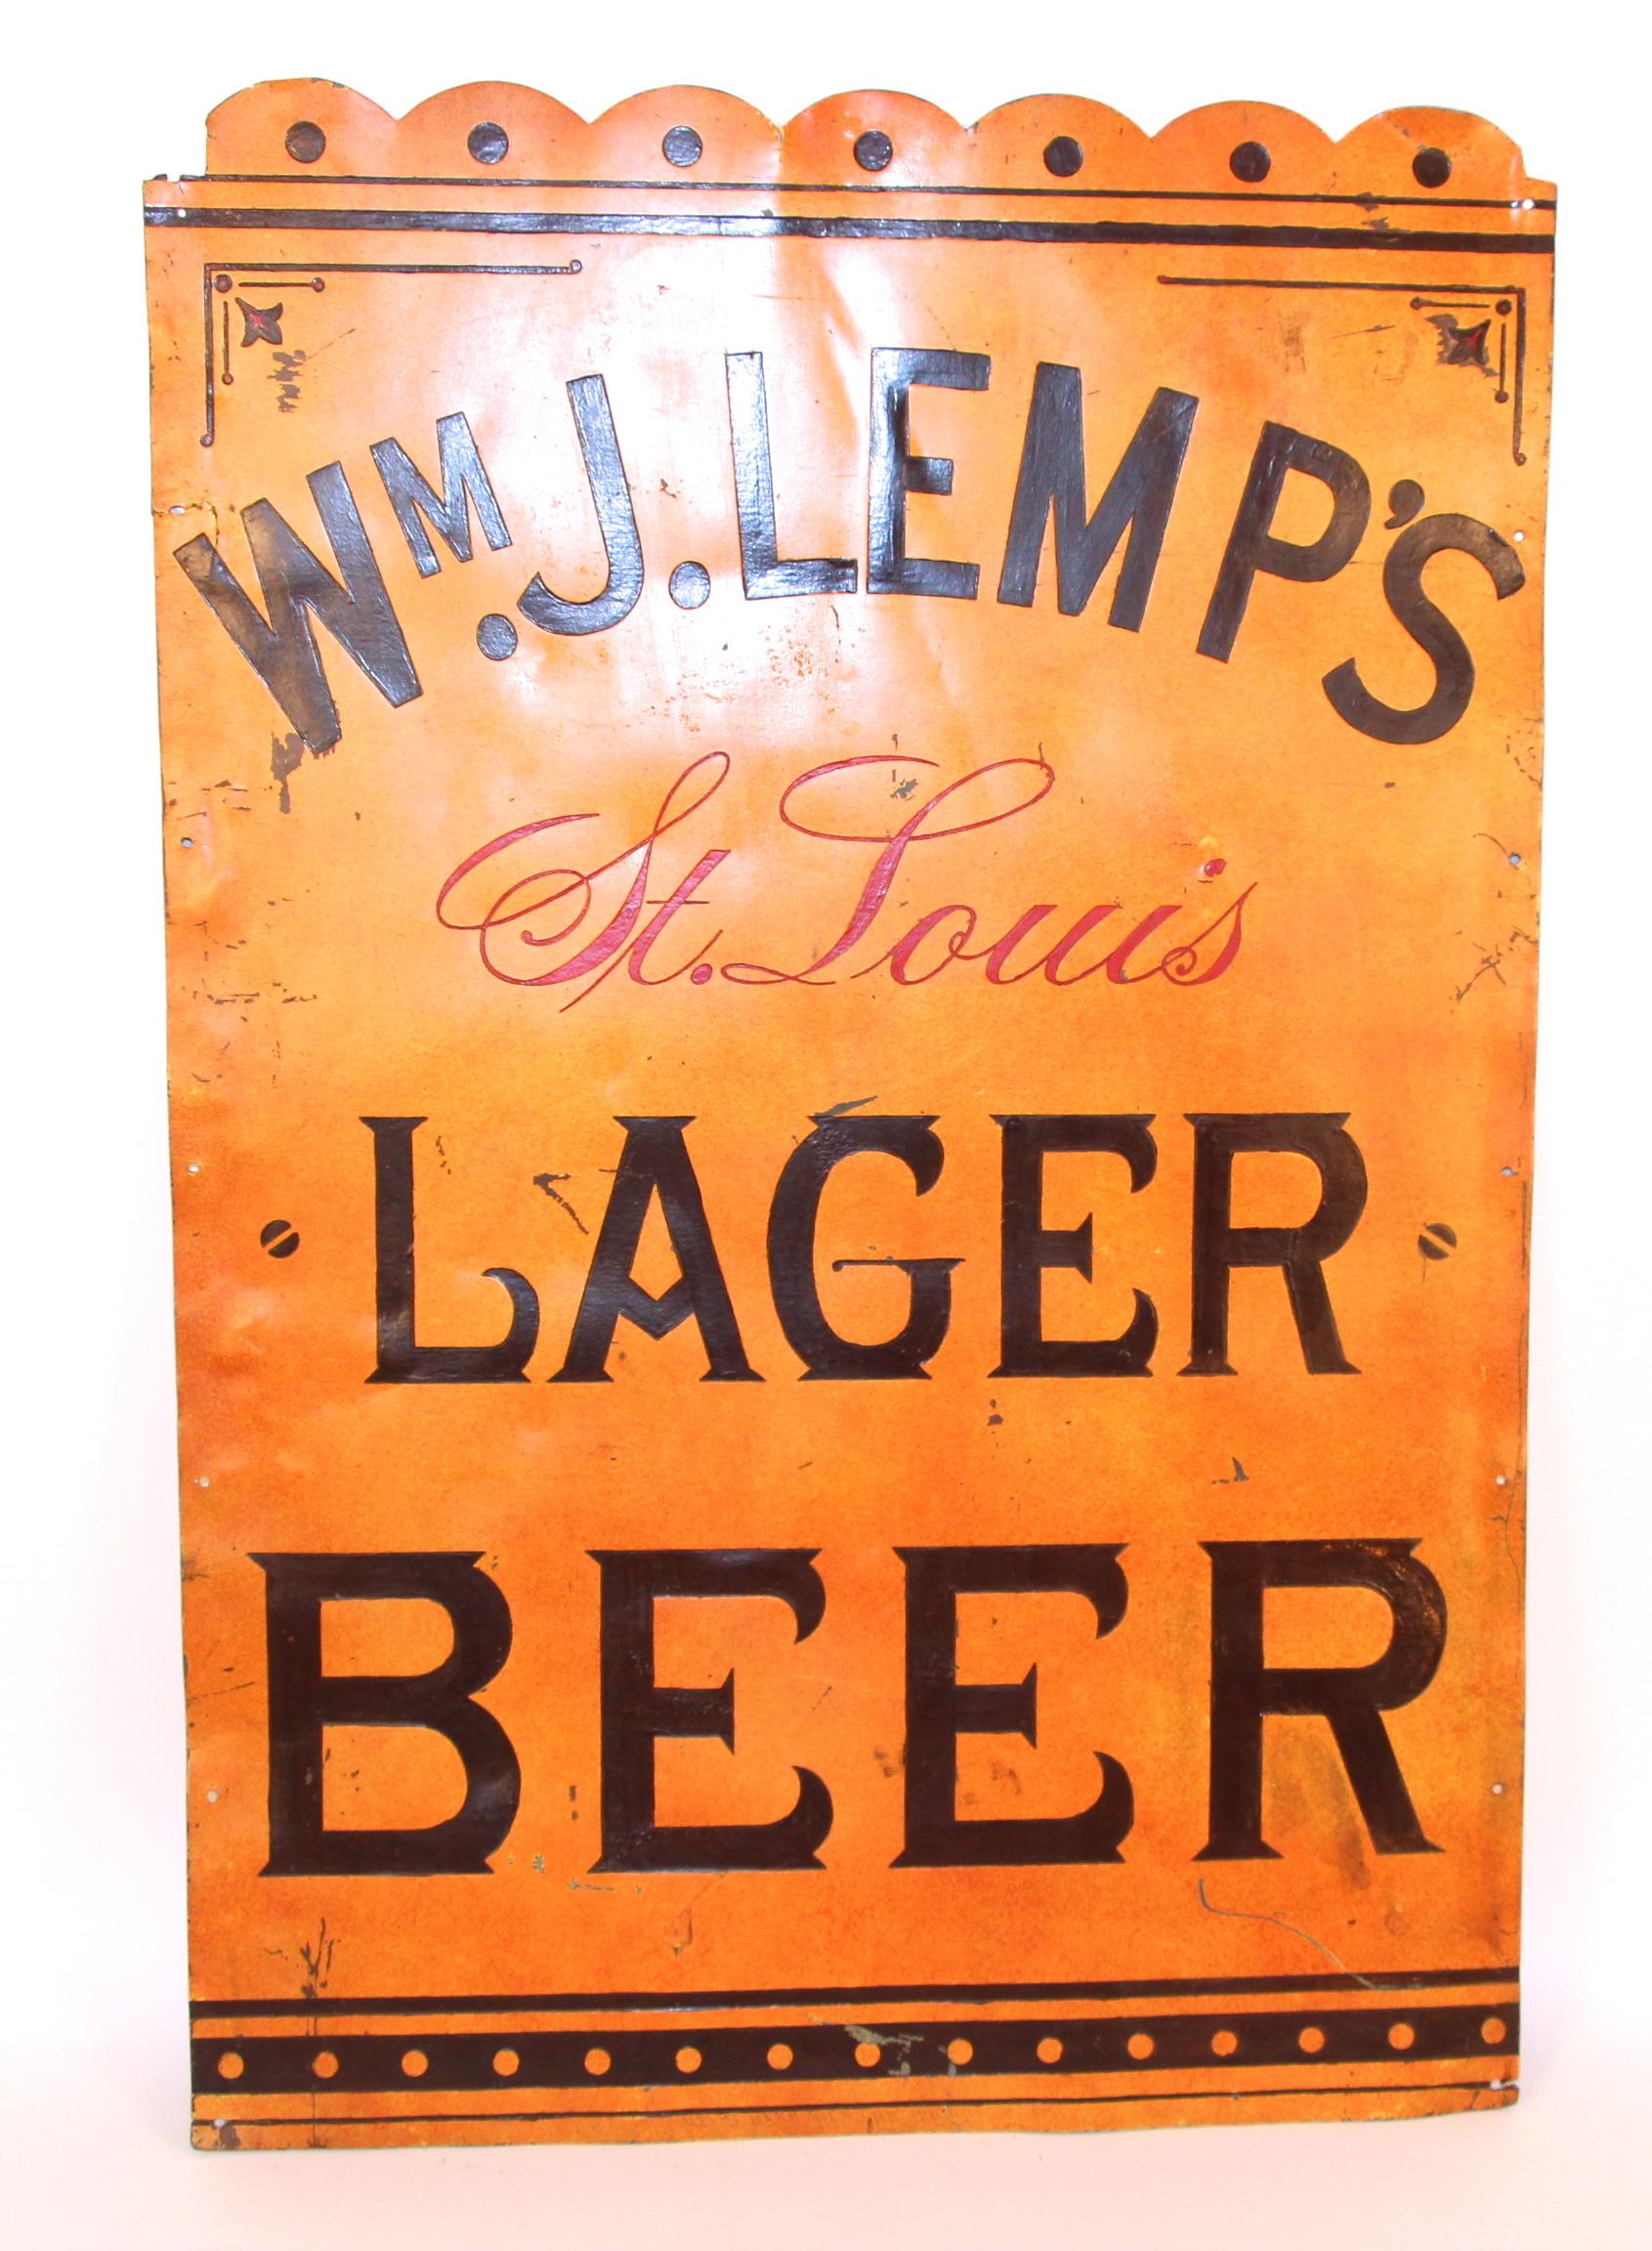 Wm. J. Lemp Brewing Co. Lager Beer, Metal Sign, St. Louis, MO. Circa 1885